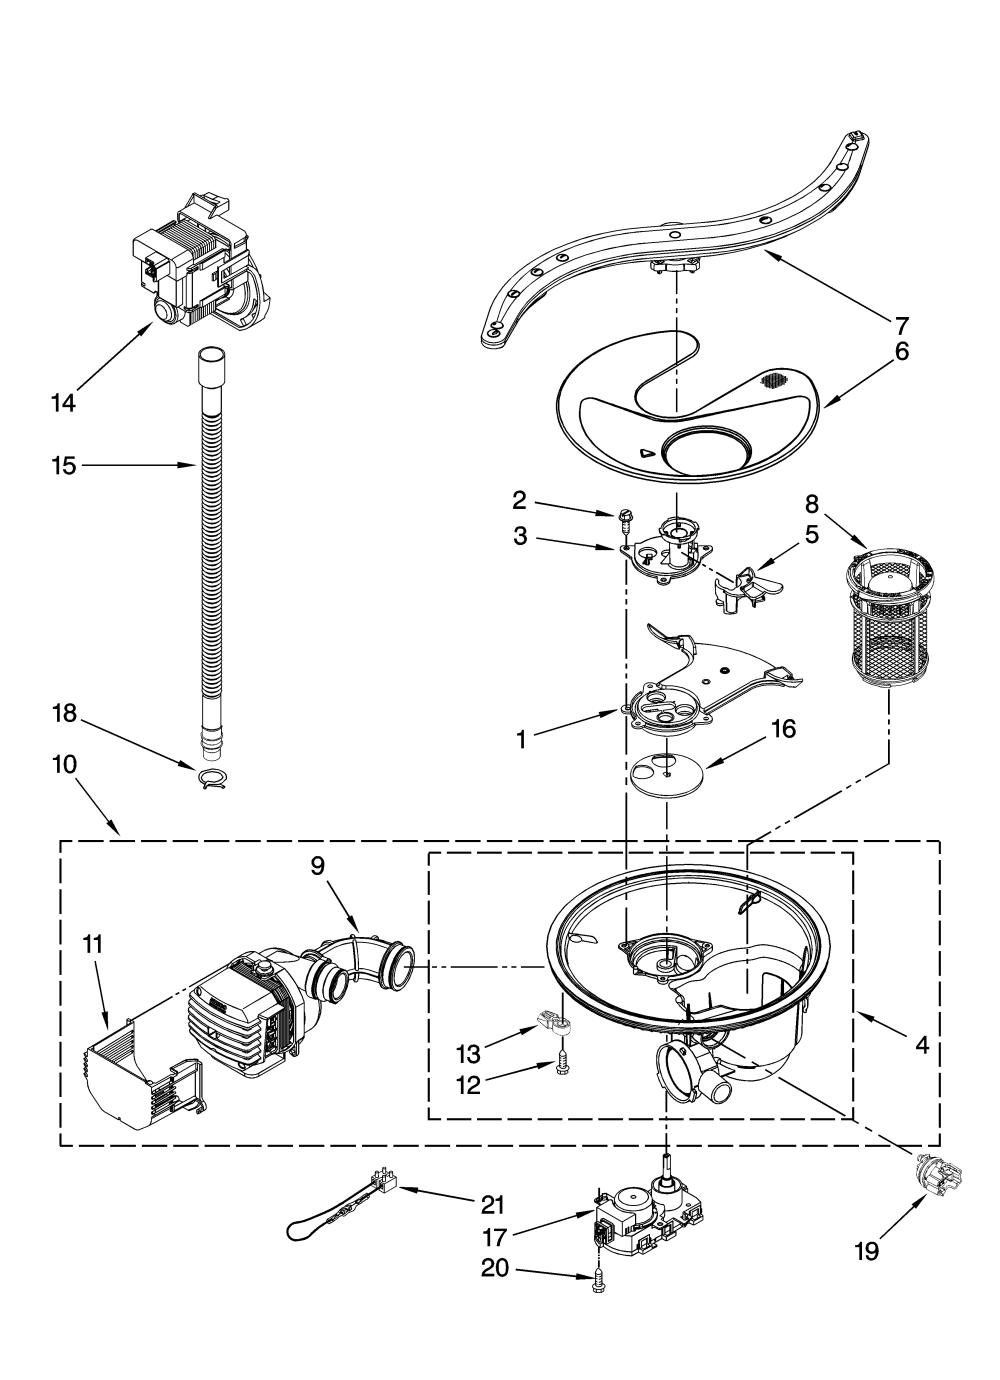 medium resolution of kenmore elite dishwasher schematic wiring diagrams for asko dishwasher schematic kenmore 665 wiring schematic